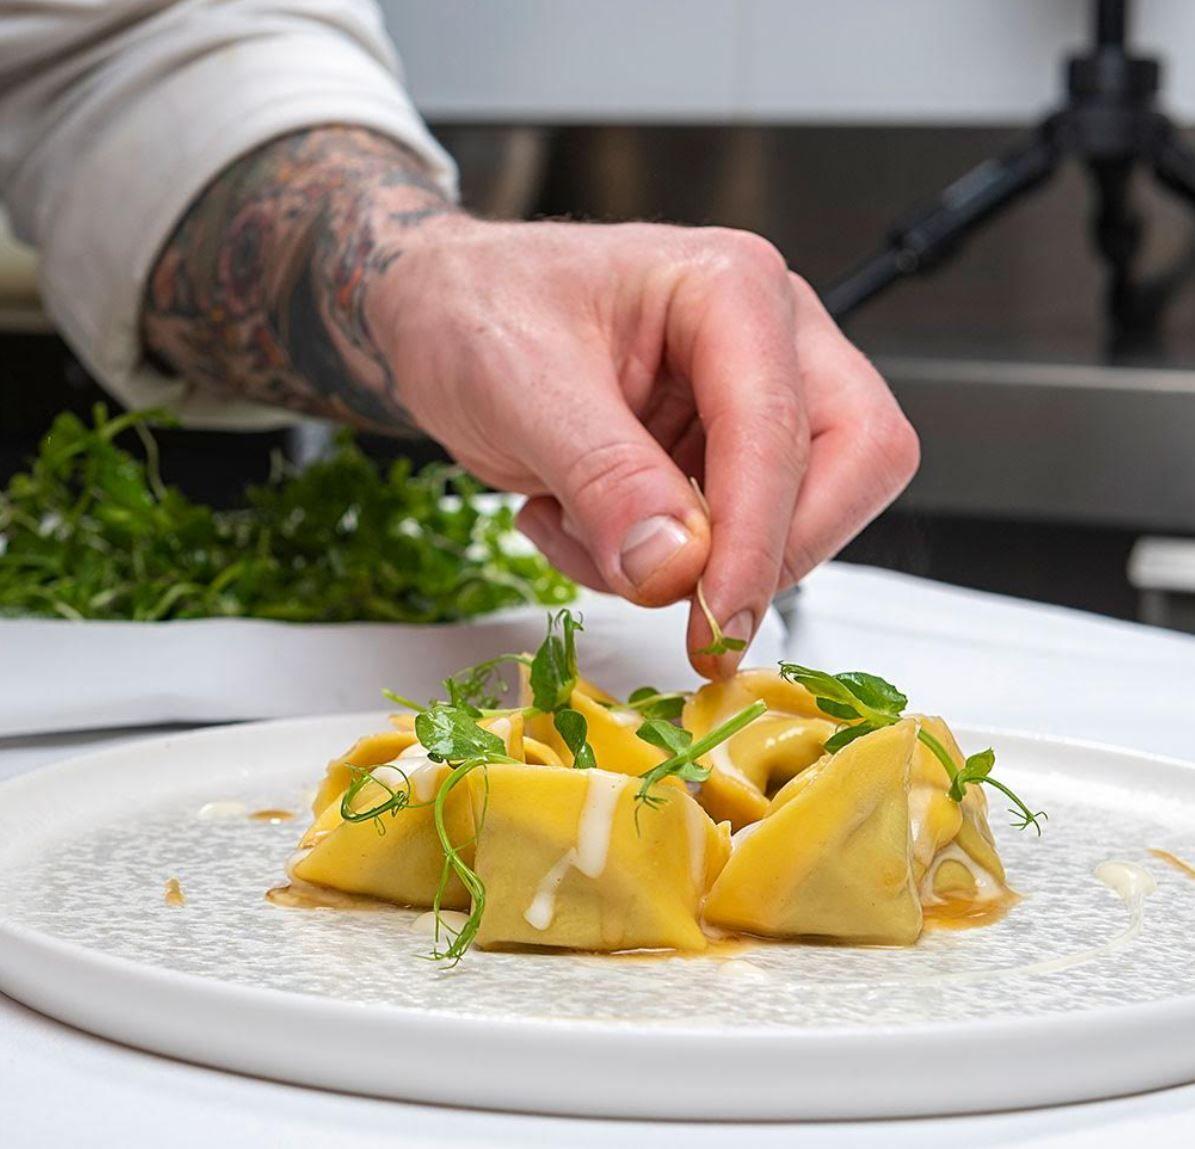 BELLO e BBUONO, cocina italiana con esencia Napolitana